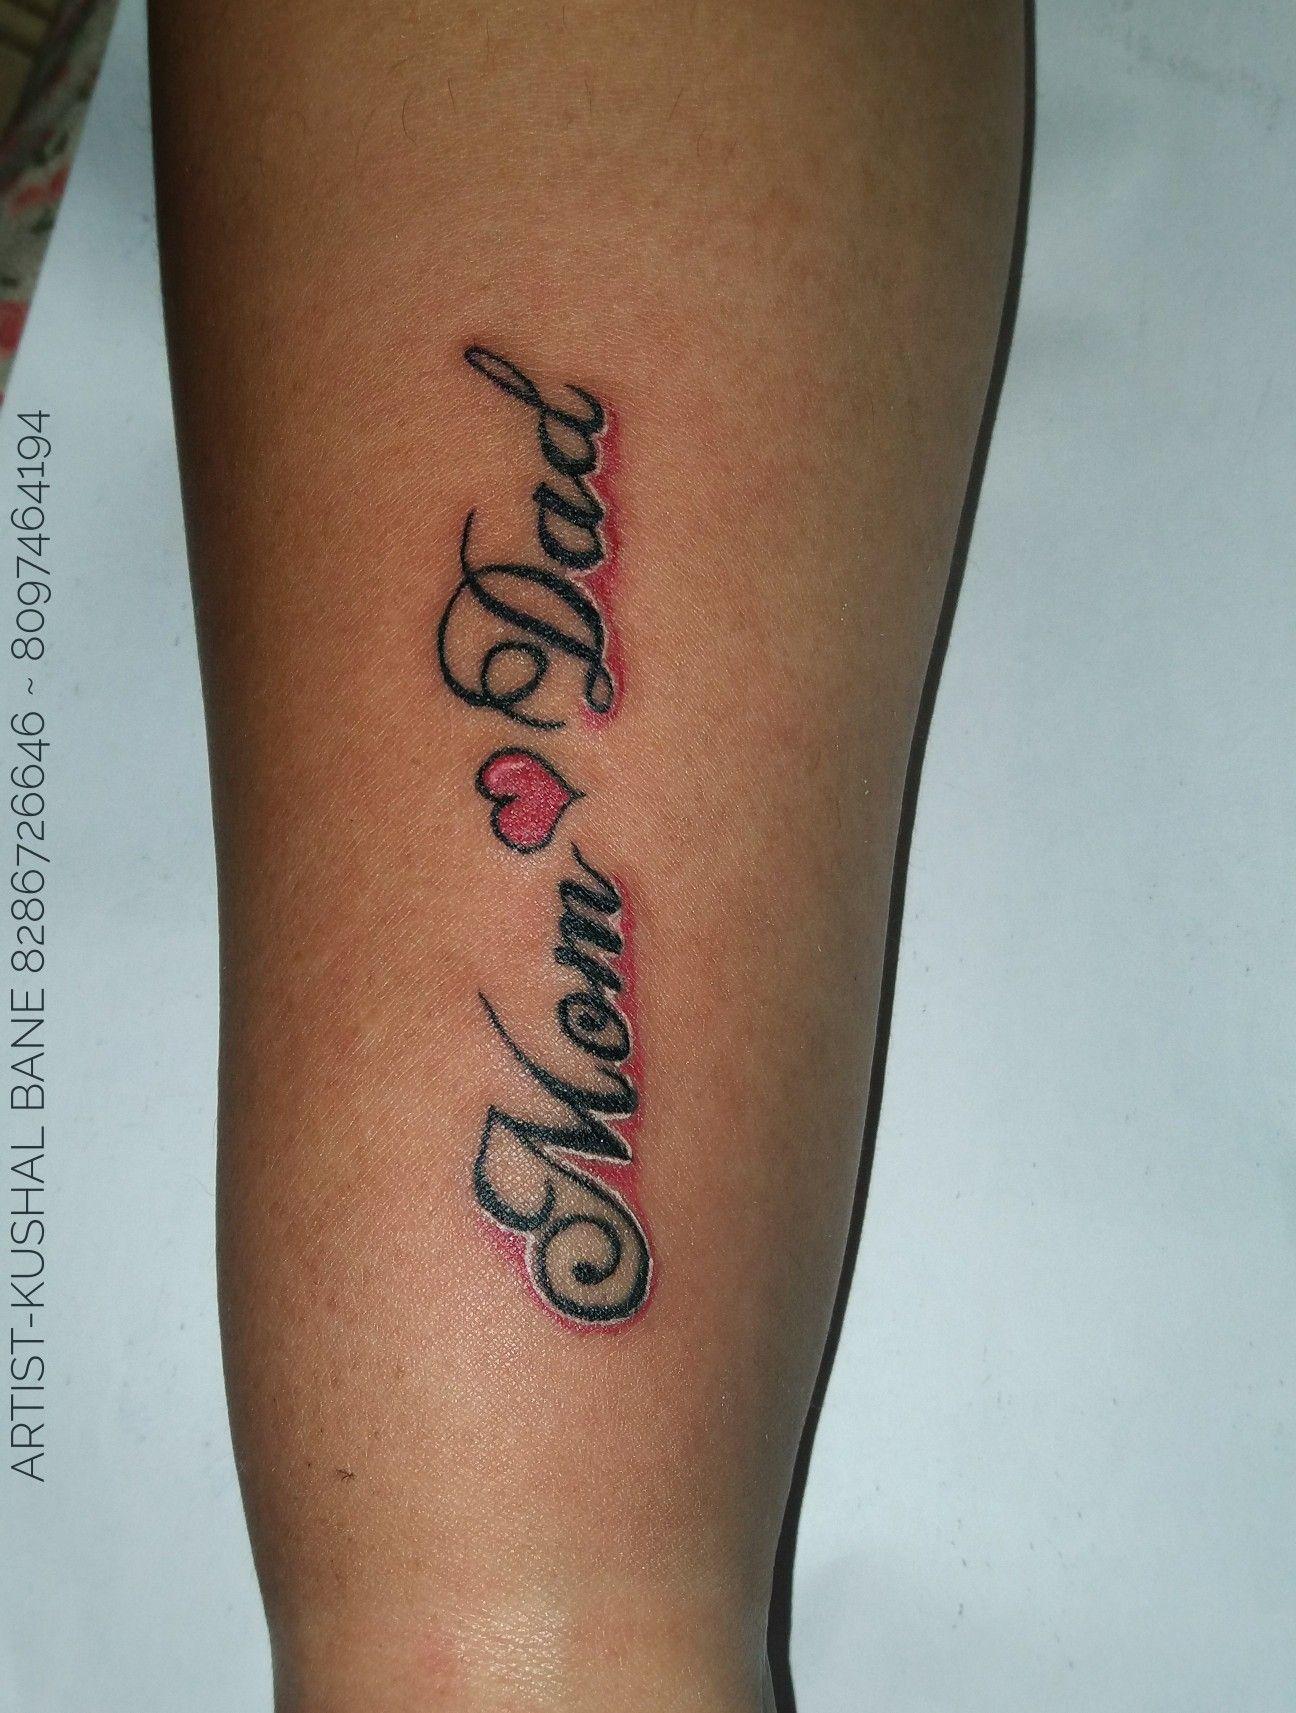 Mom Dad Tattoo Dad Tattoos Mom Dad Tattoos Mum And Dad Tattoos